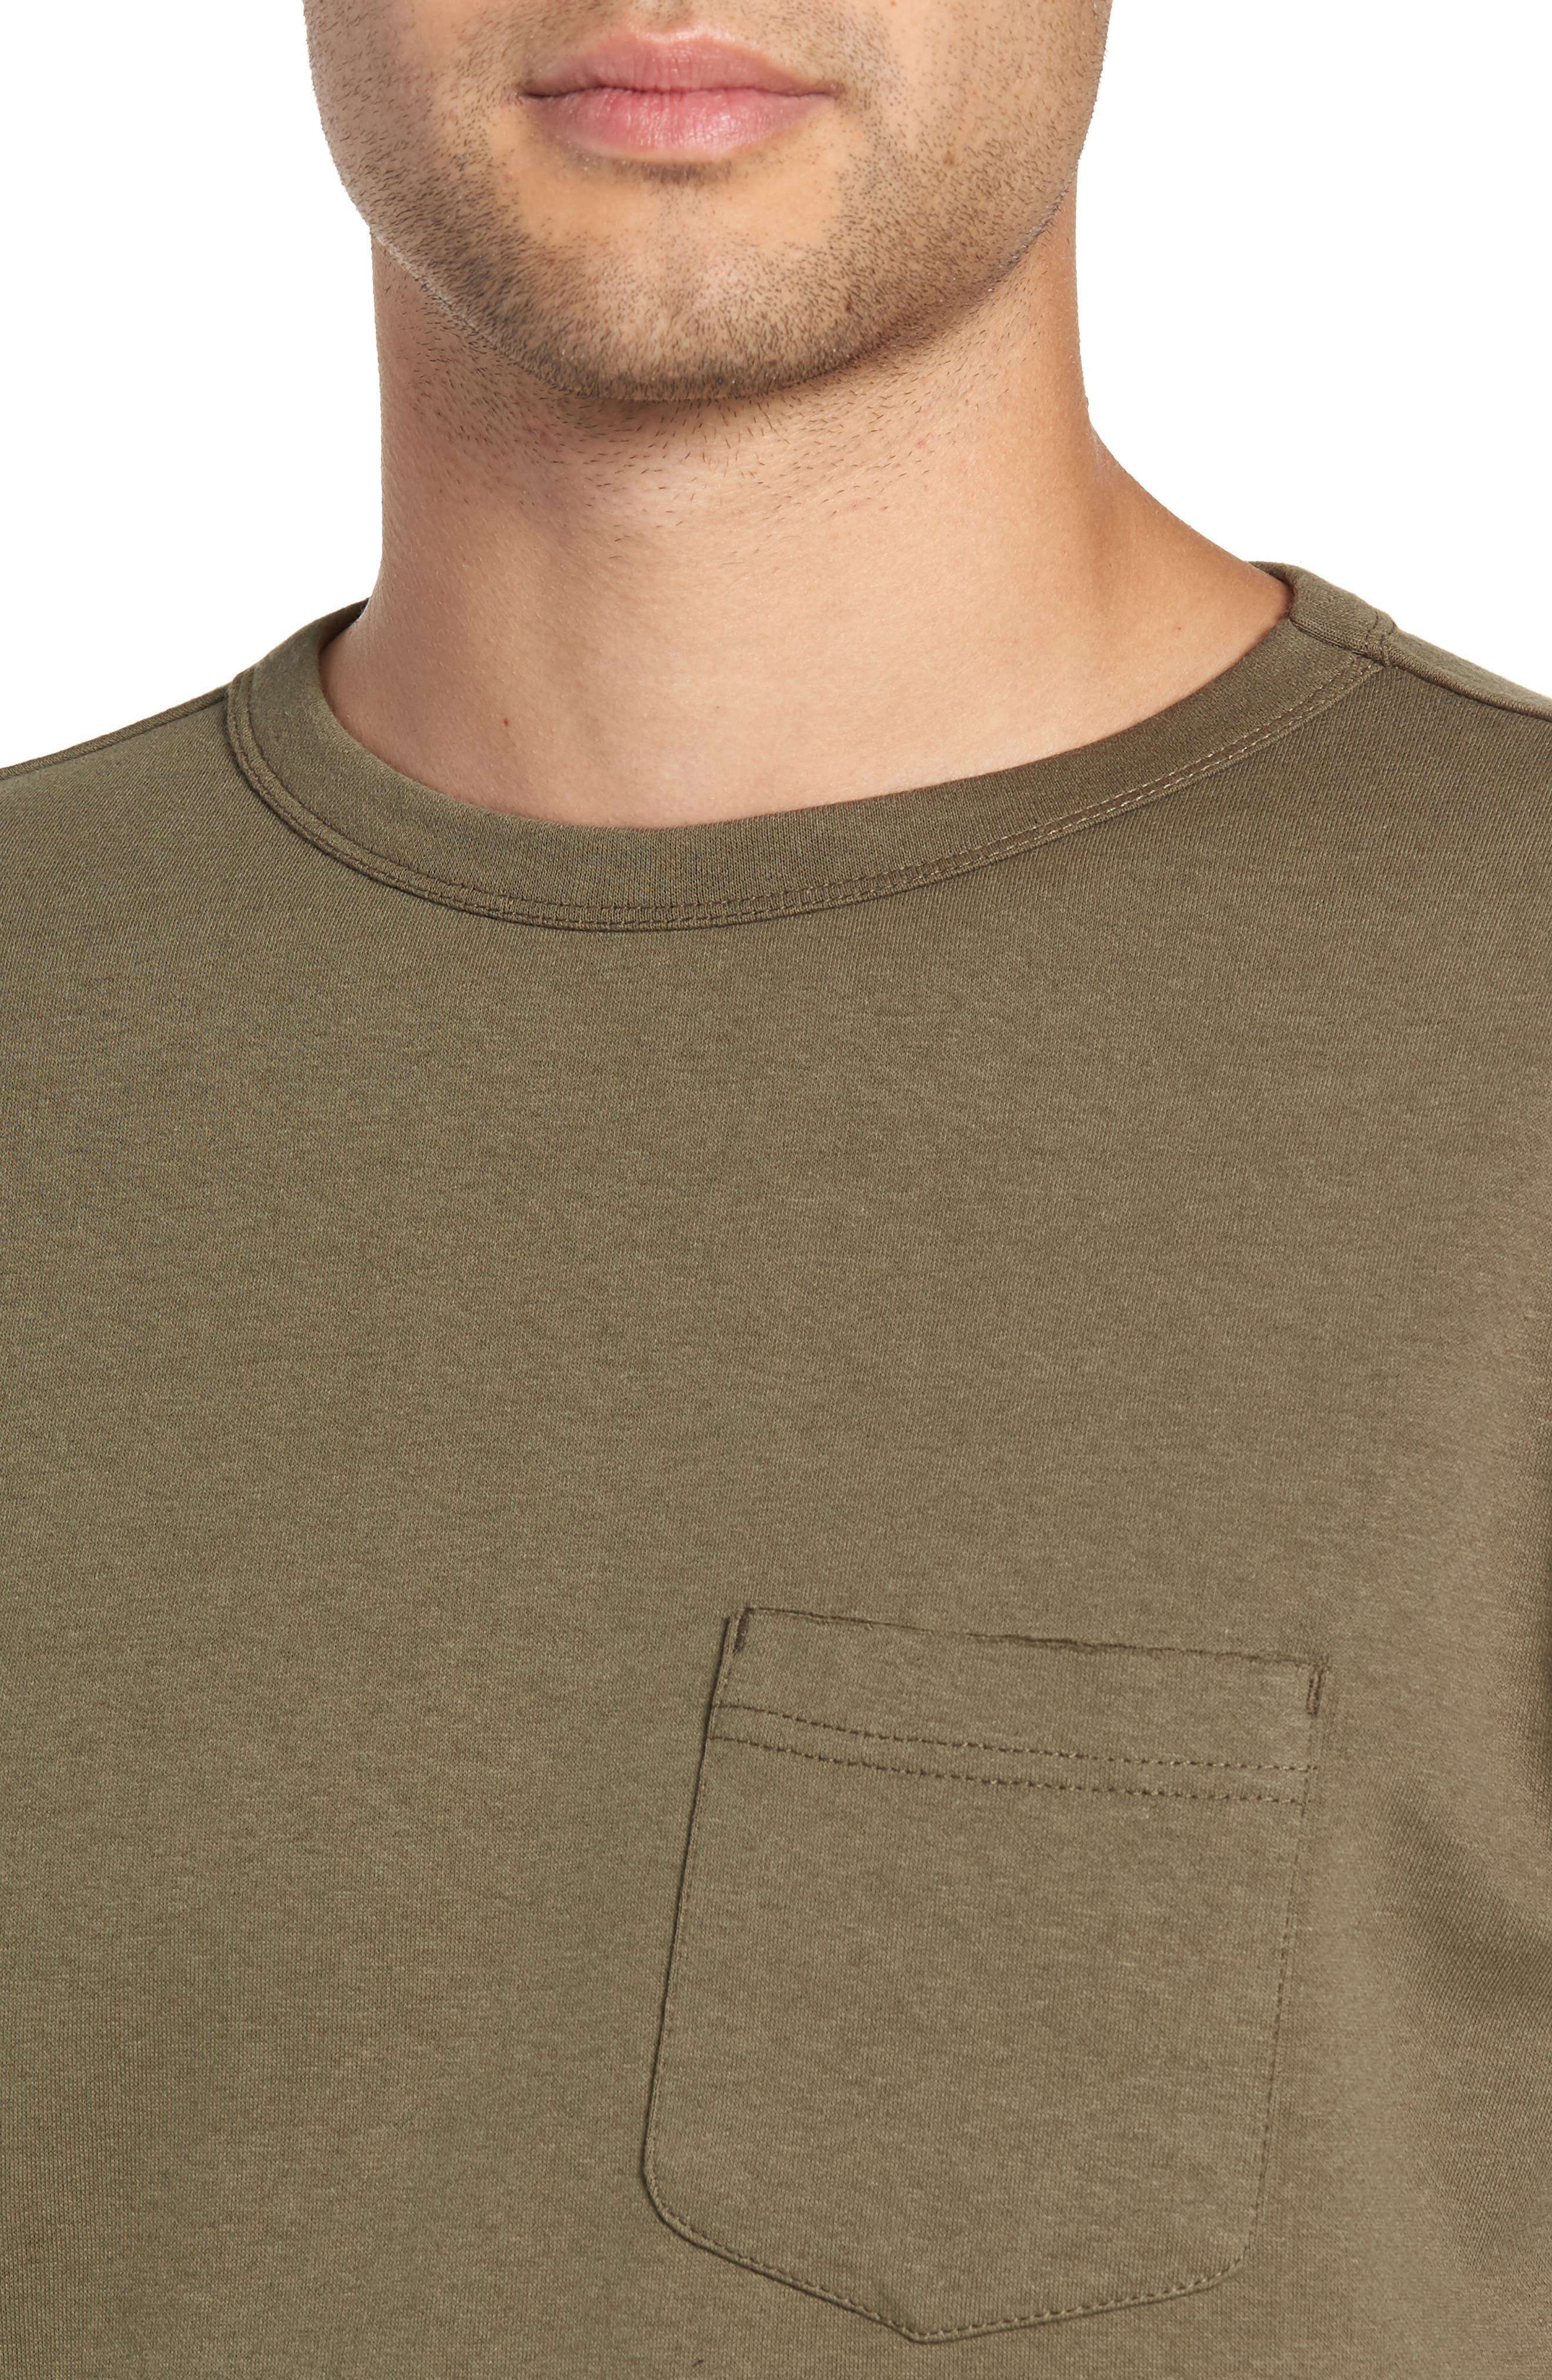 Trim Fit Long Sleeve Pocket T-Shirt,                             Alternate thumbnail 4, color,                             OLIVE